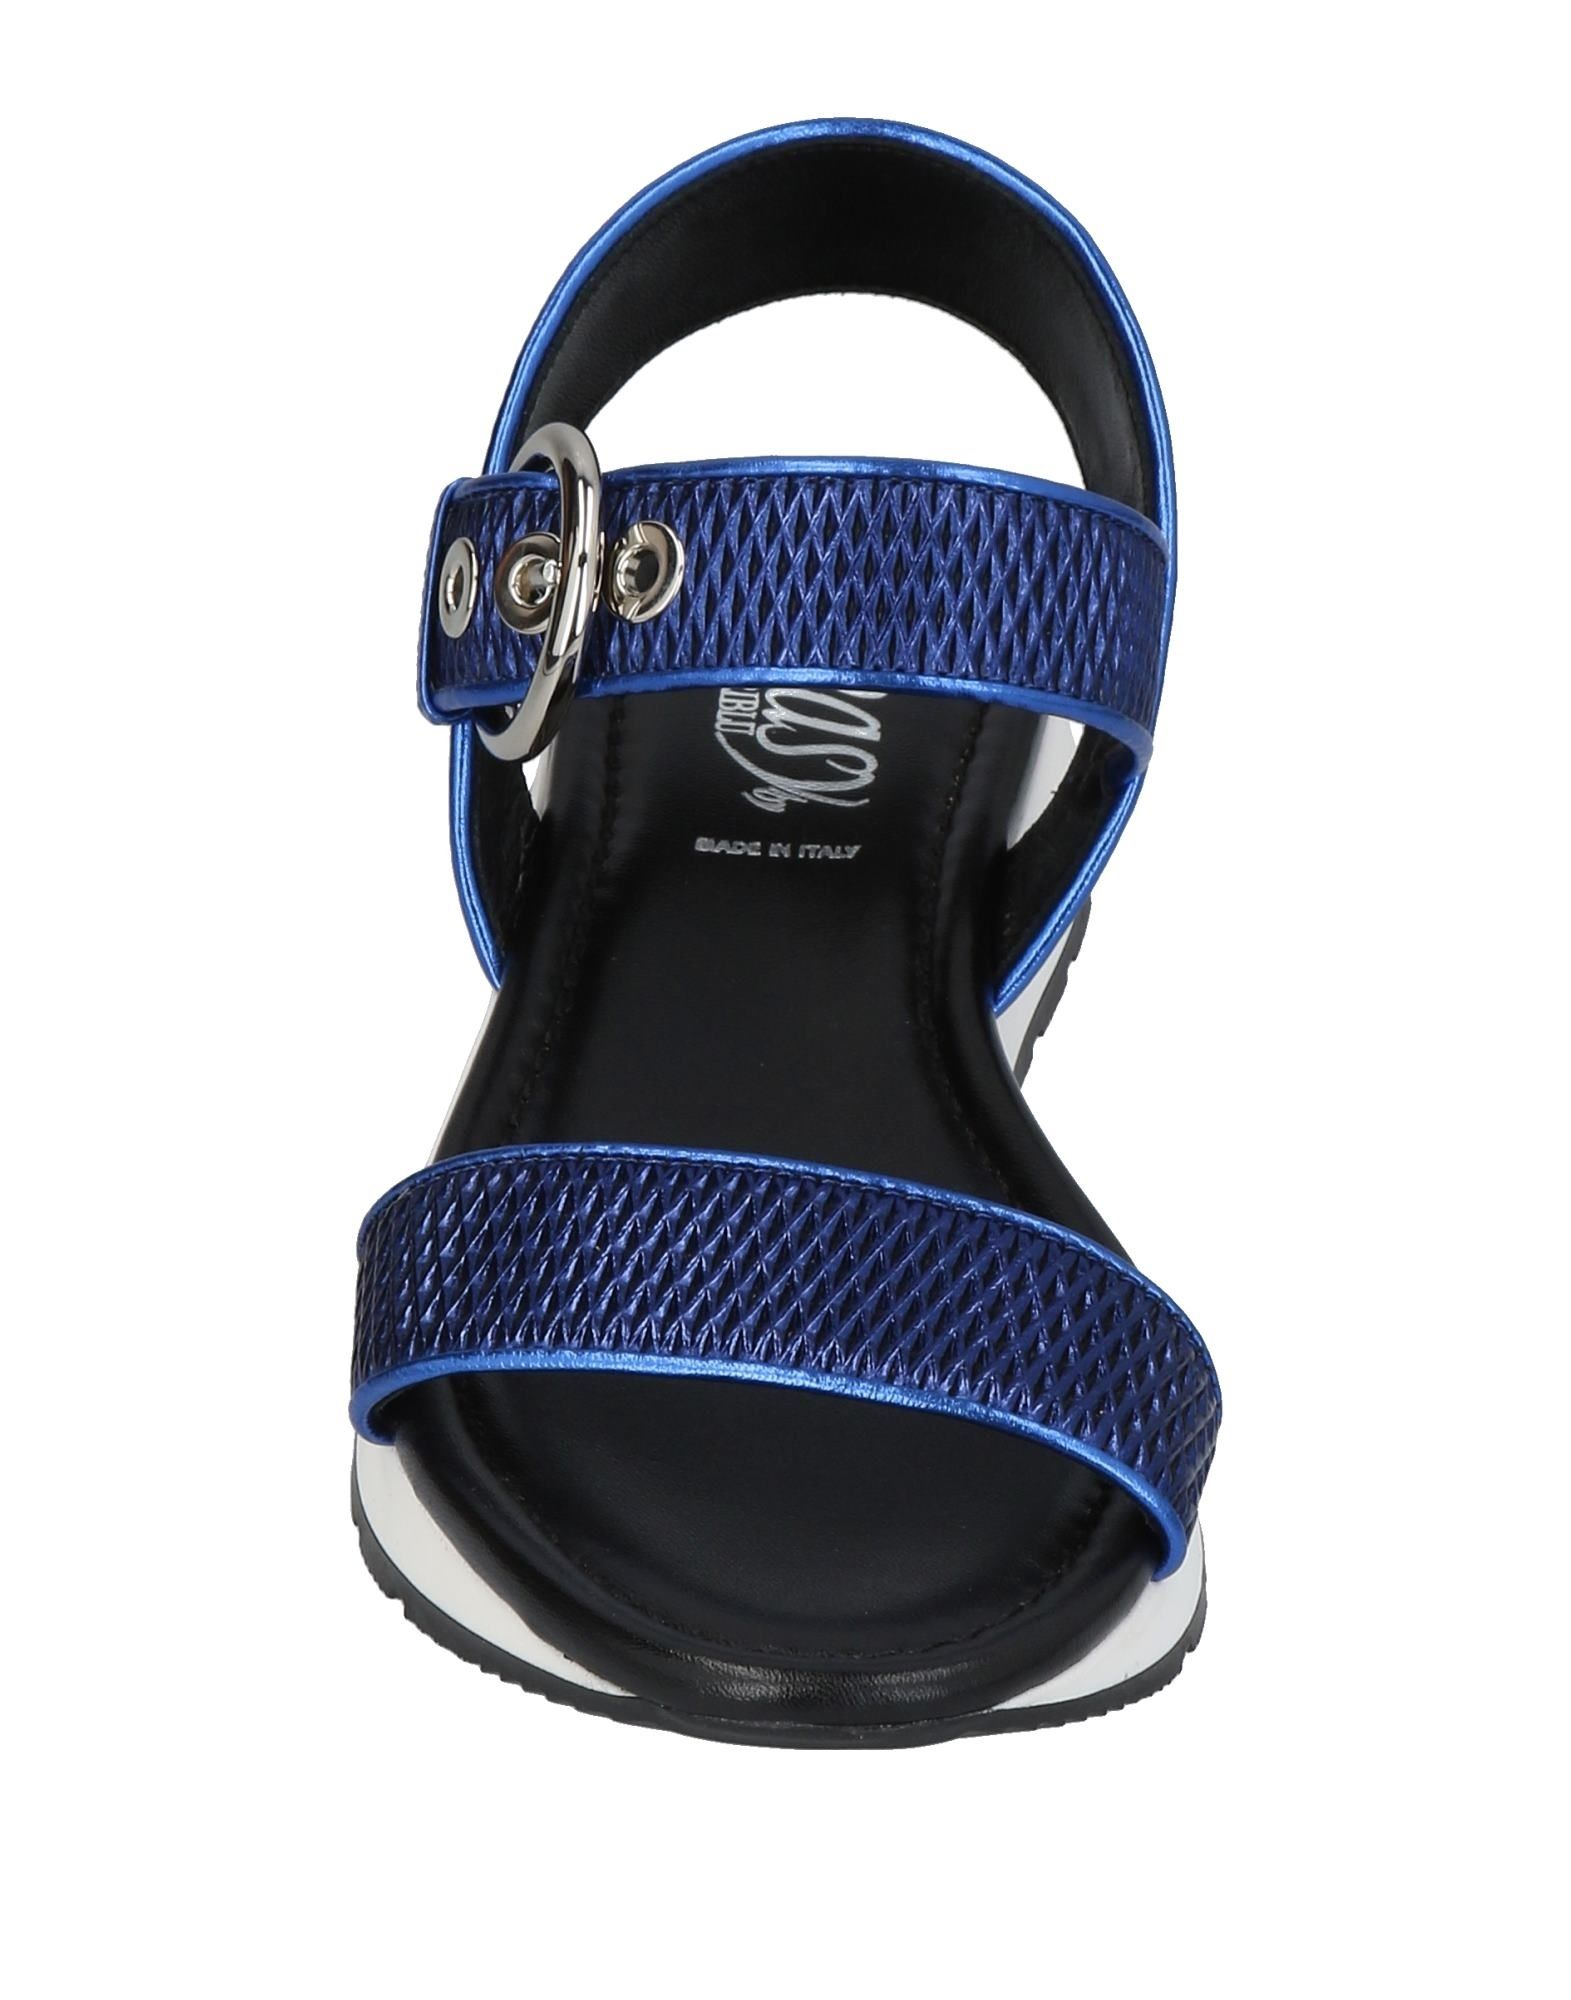 Loriblu Sandalen Gute Damen  11423388HK Gute Sandalen Qualität beliebte Schuhe 81c8ac